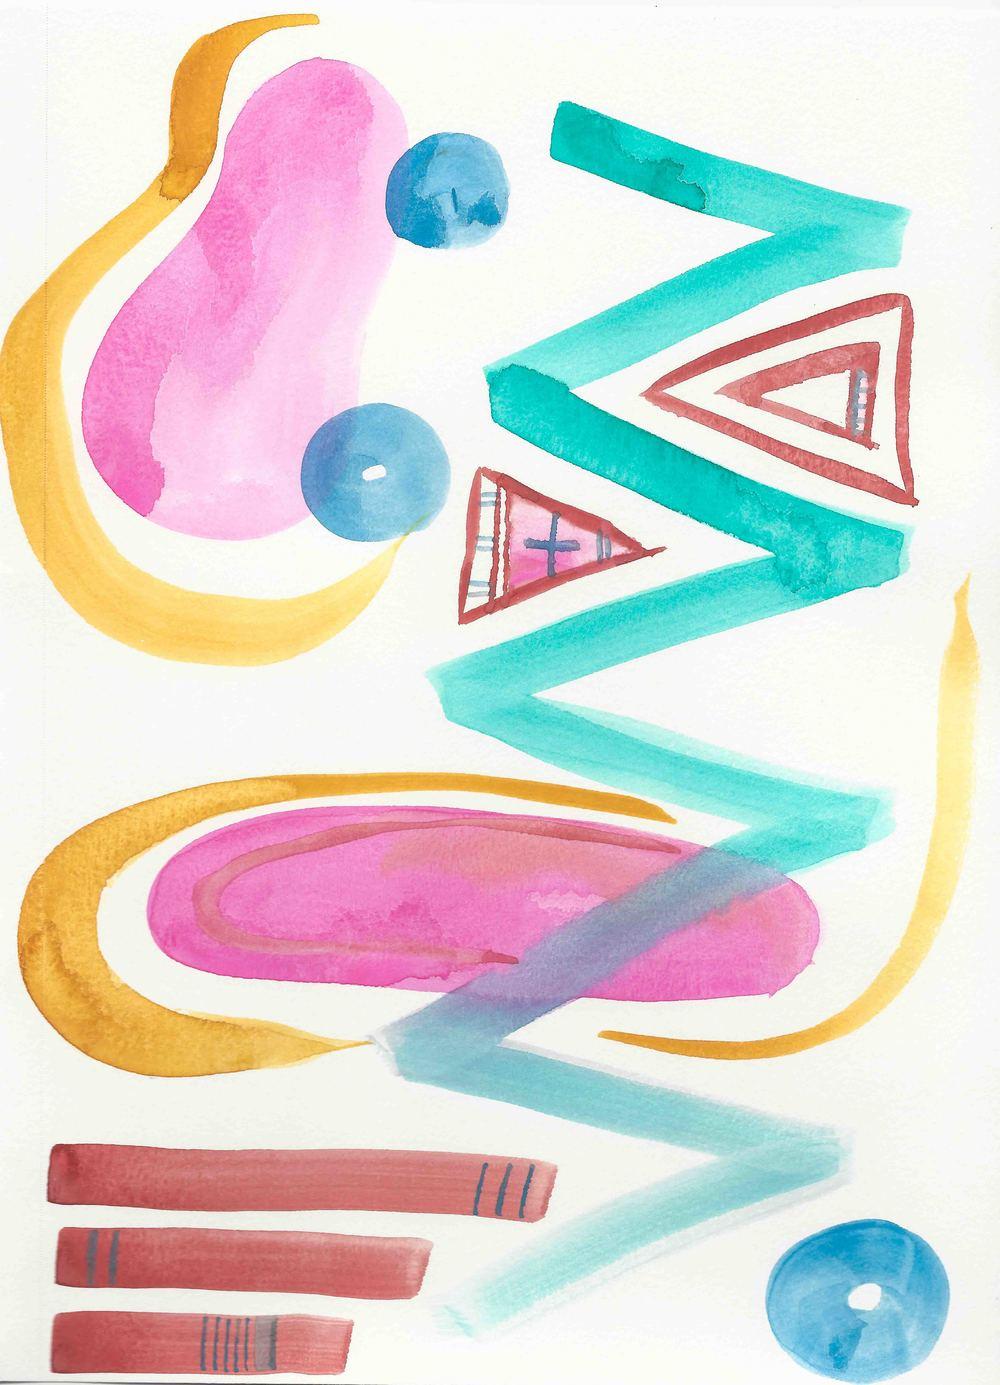 watercolor shapes 7x10 paper.jpg